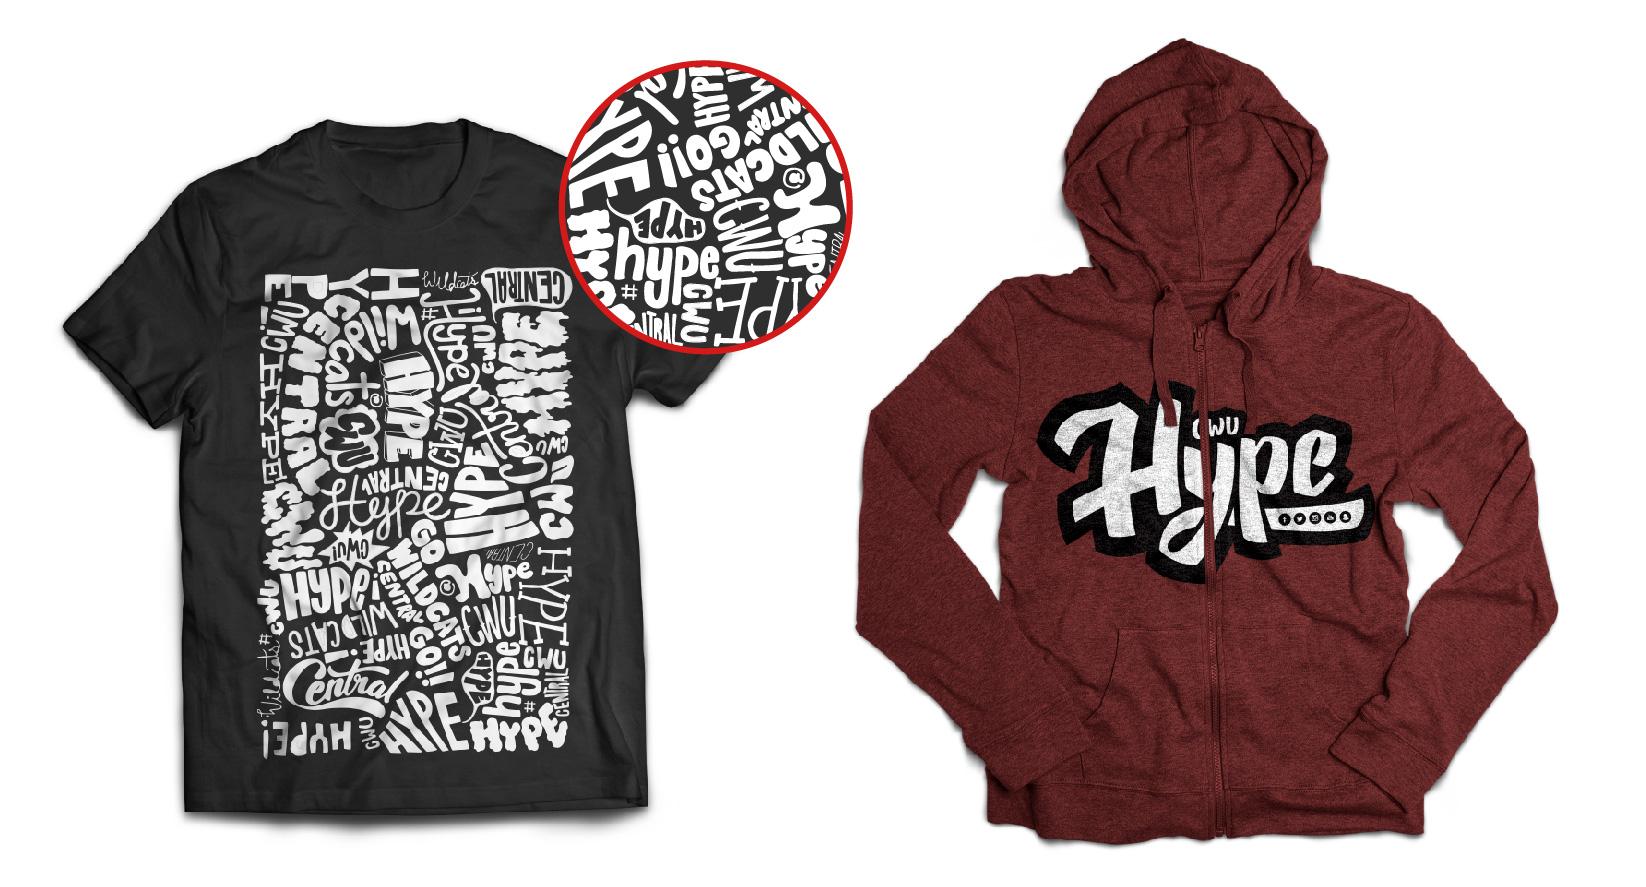 Clothing+Hype-01.jpg